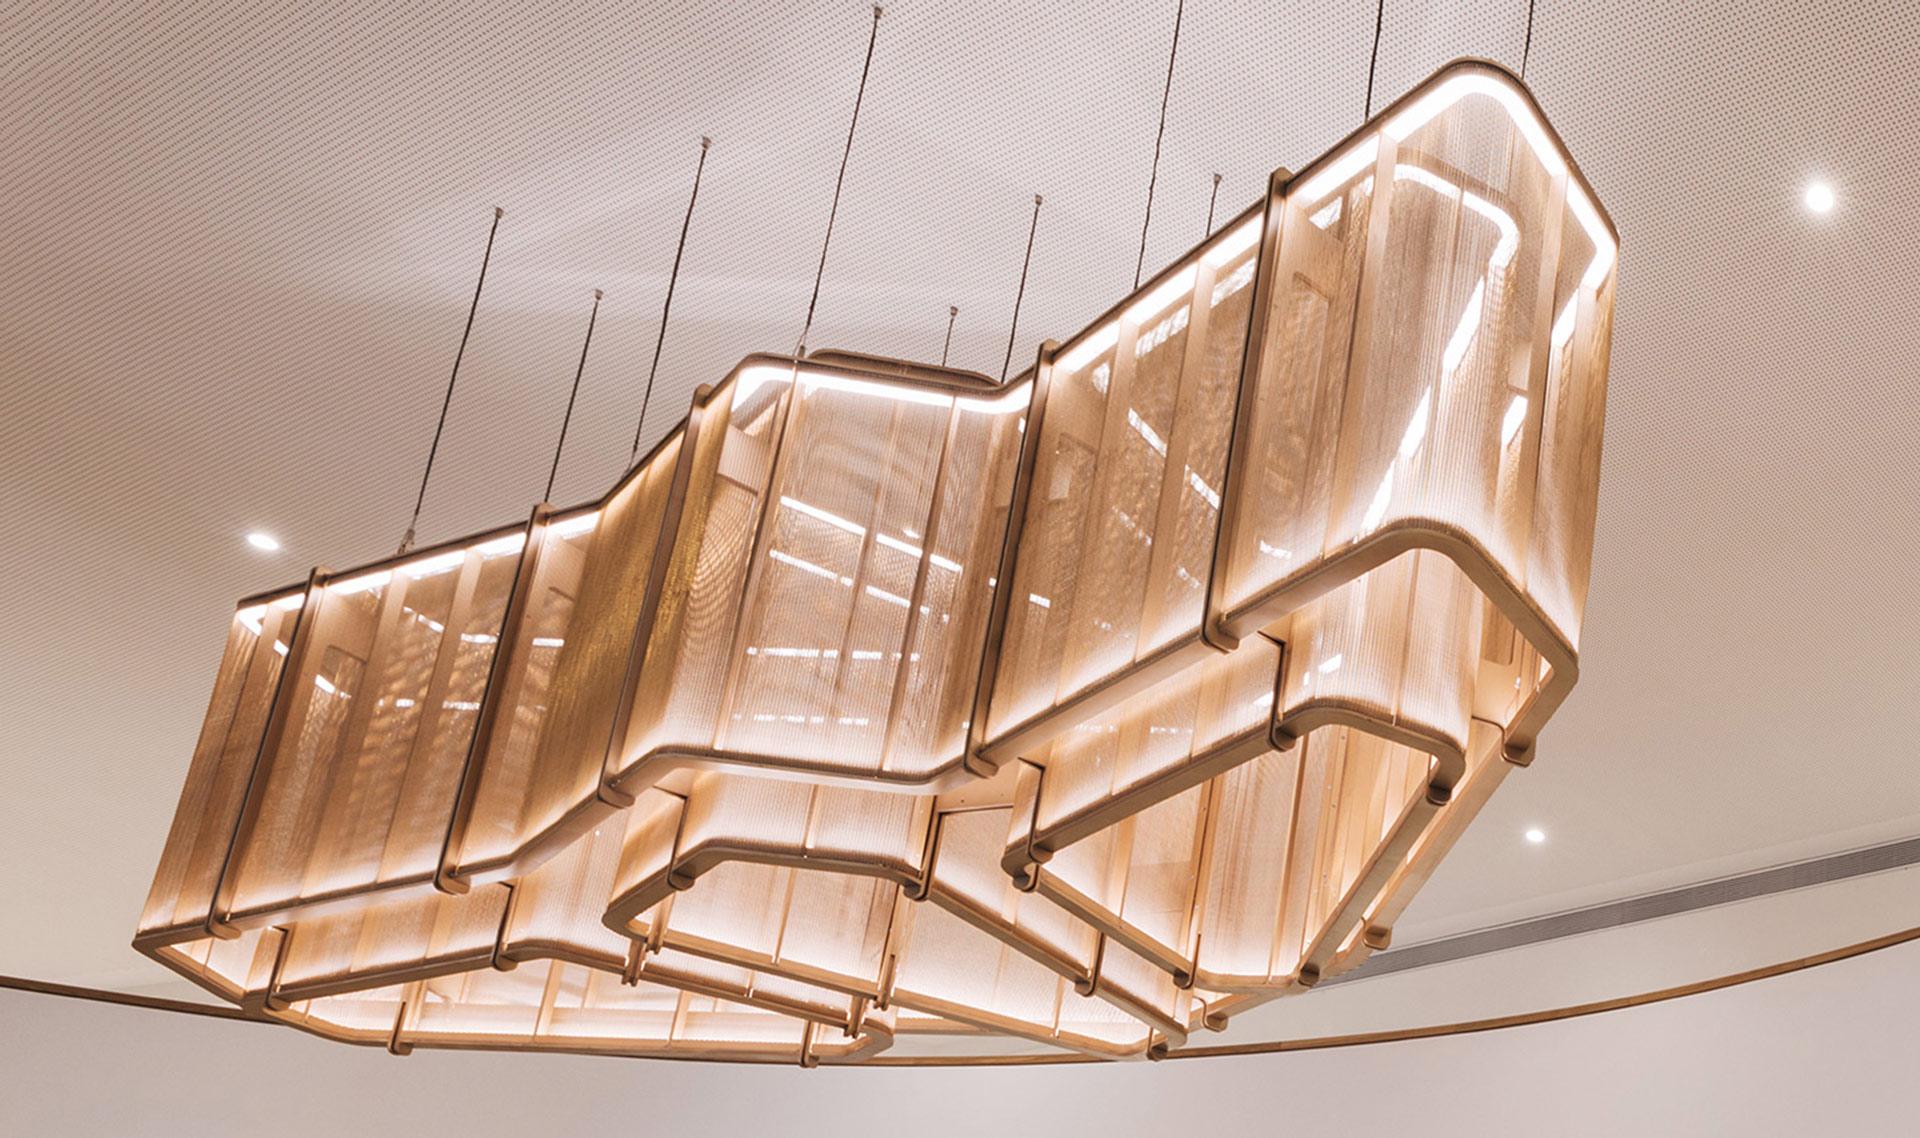 IPZ-25 woven wire mesh chandelier